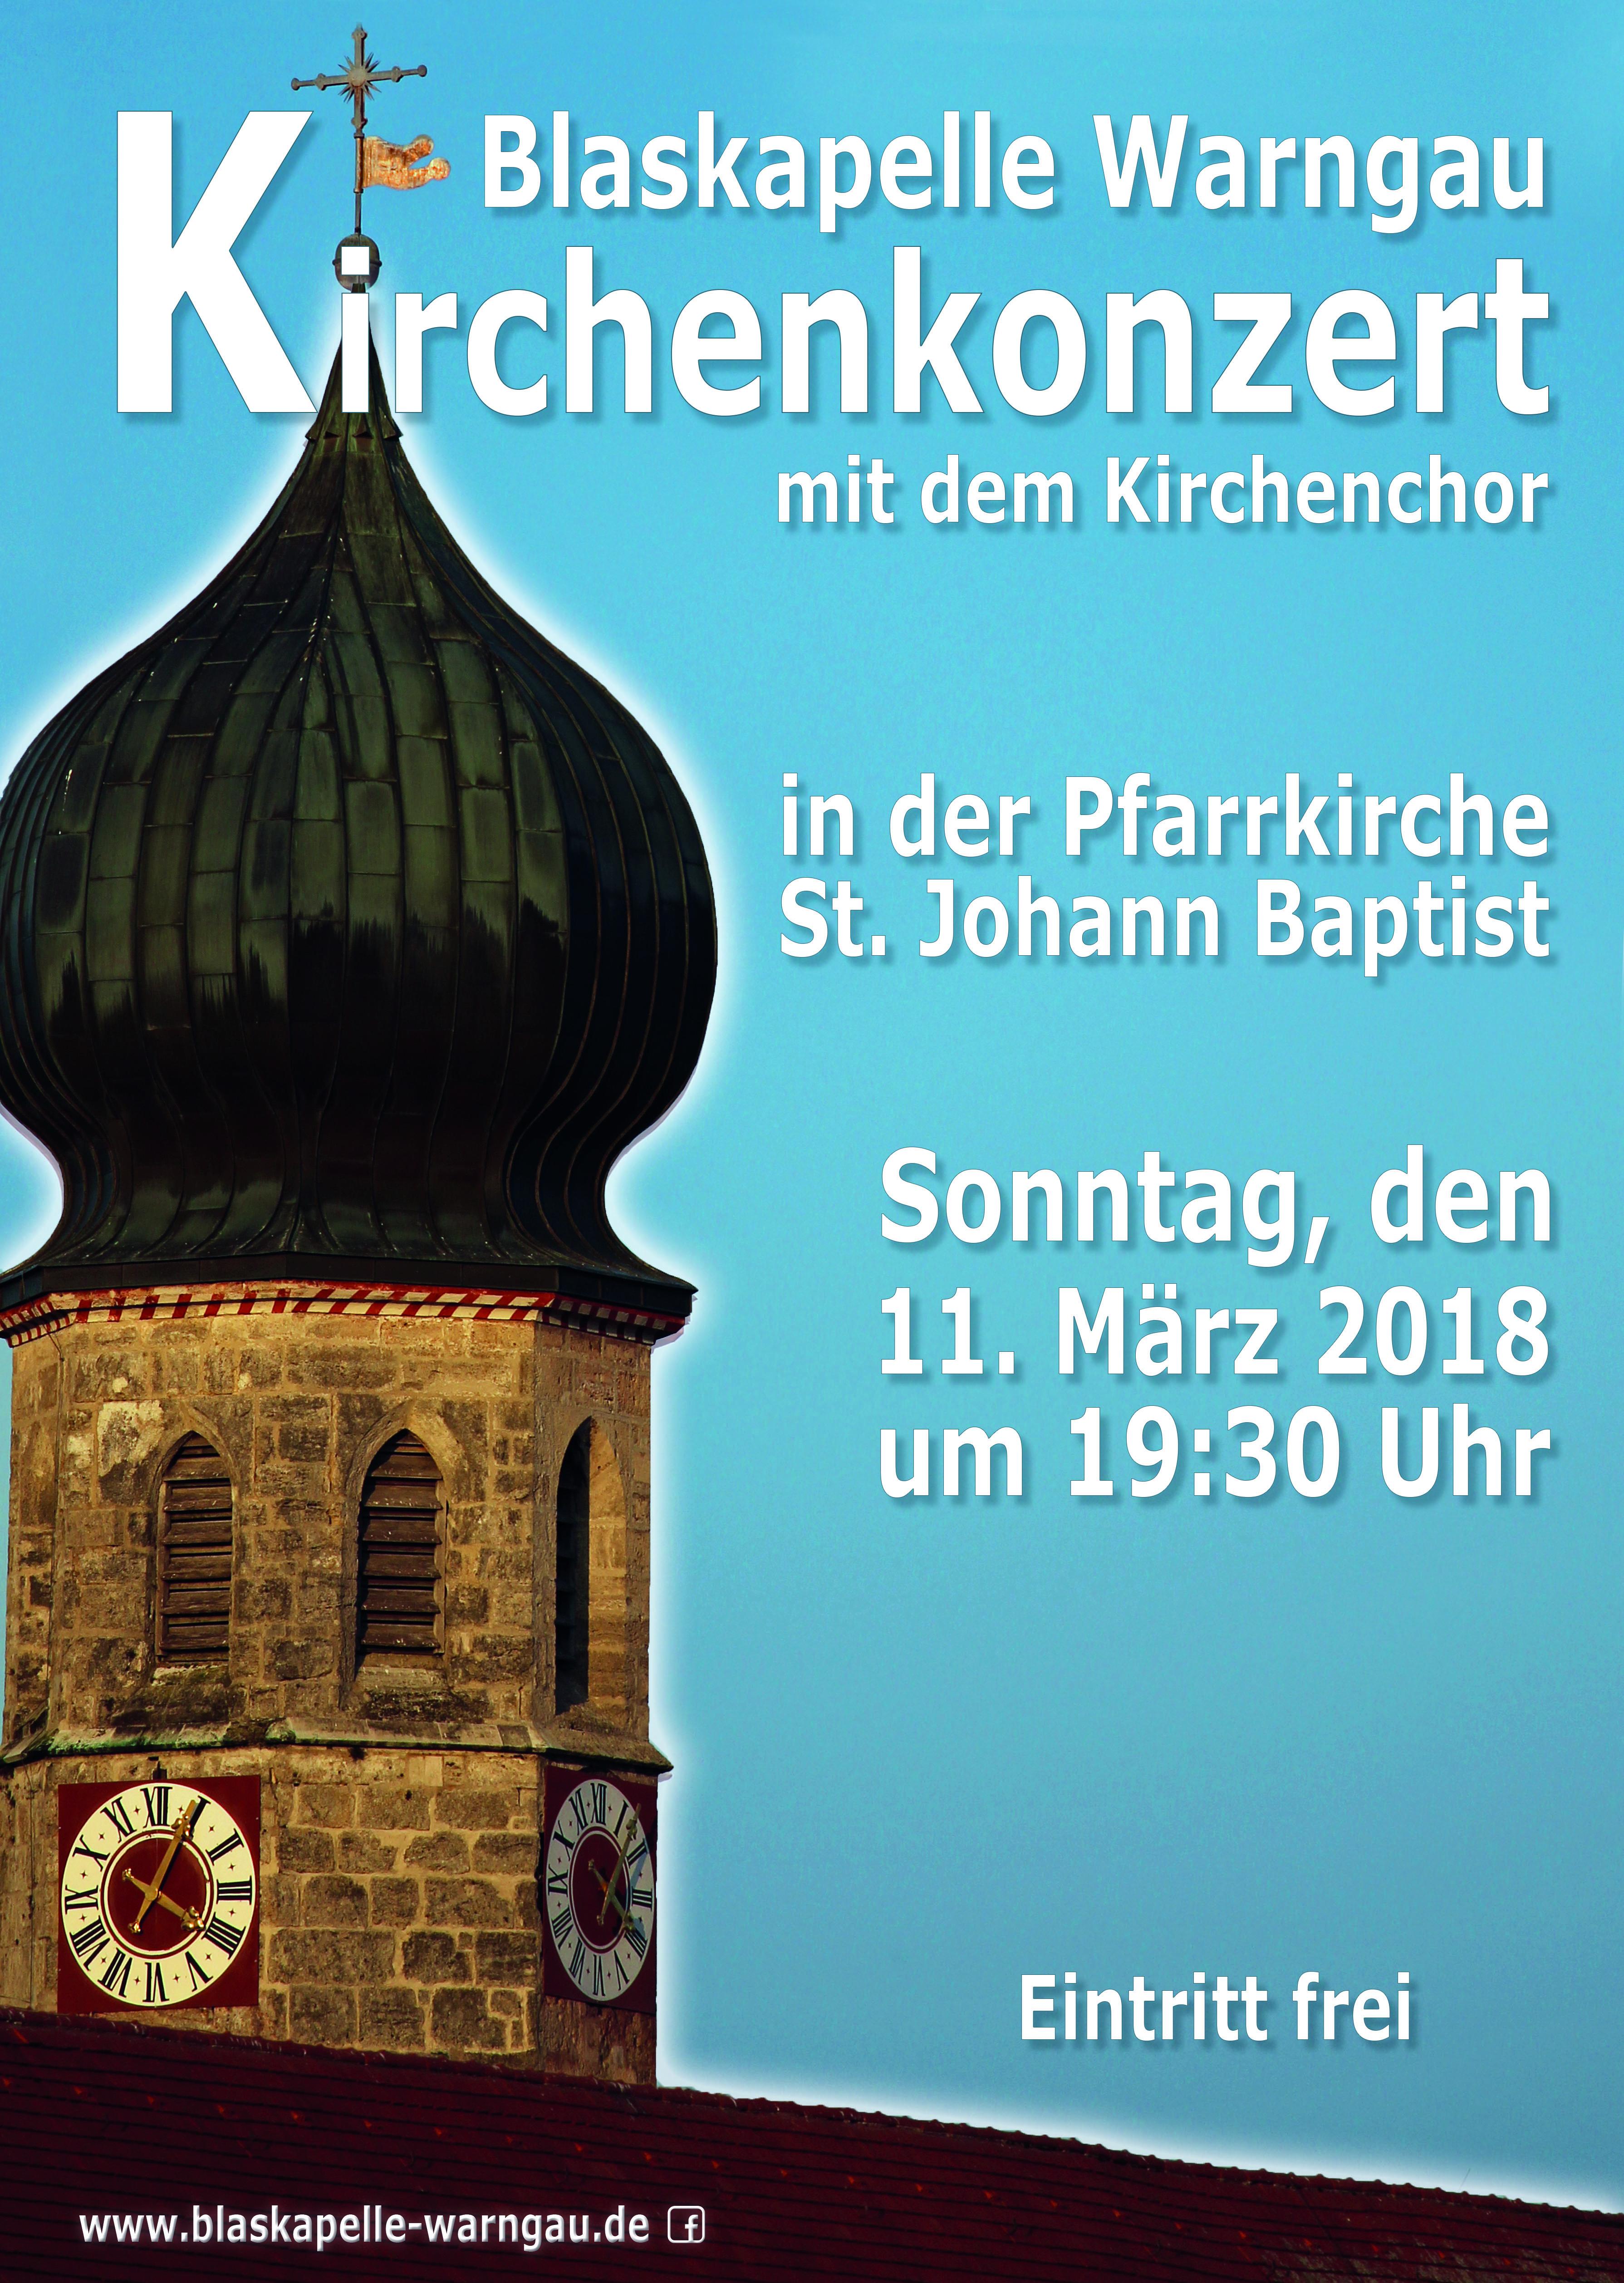 Blaskapelle Warngau, Kirchenkonzert, Kirchenchor, Blasmusik, Blaskapelle, Warngau, Kirche, Plakat, Plakat Blaskapelle